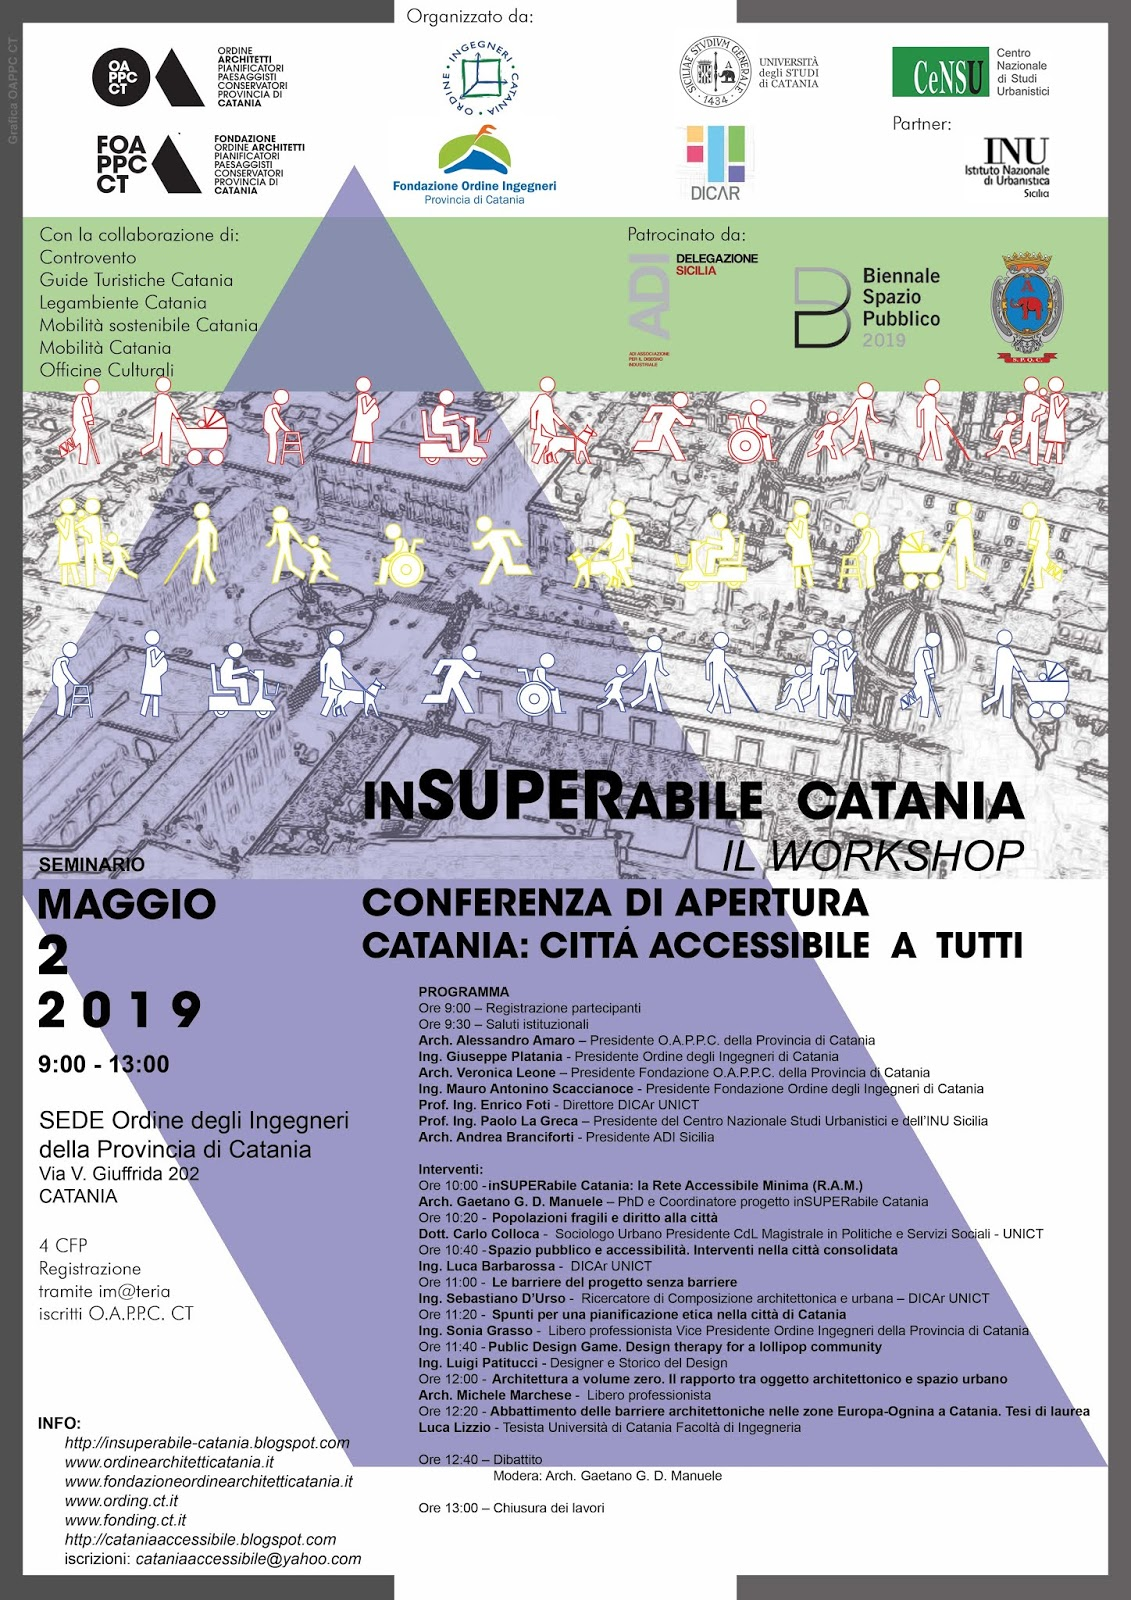 Lavoro Ingegnere Edile Architetto Catania catania accessibile